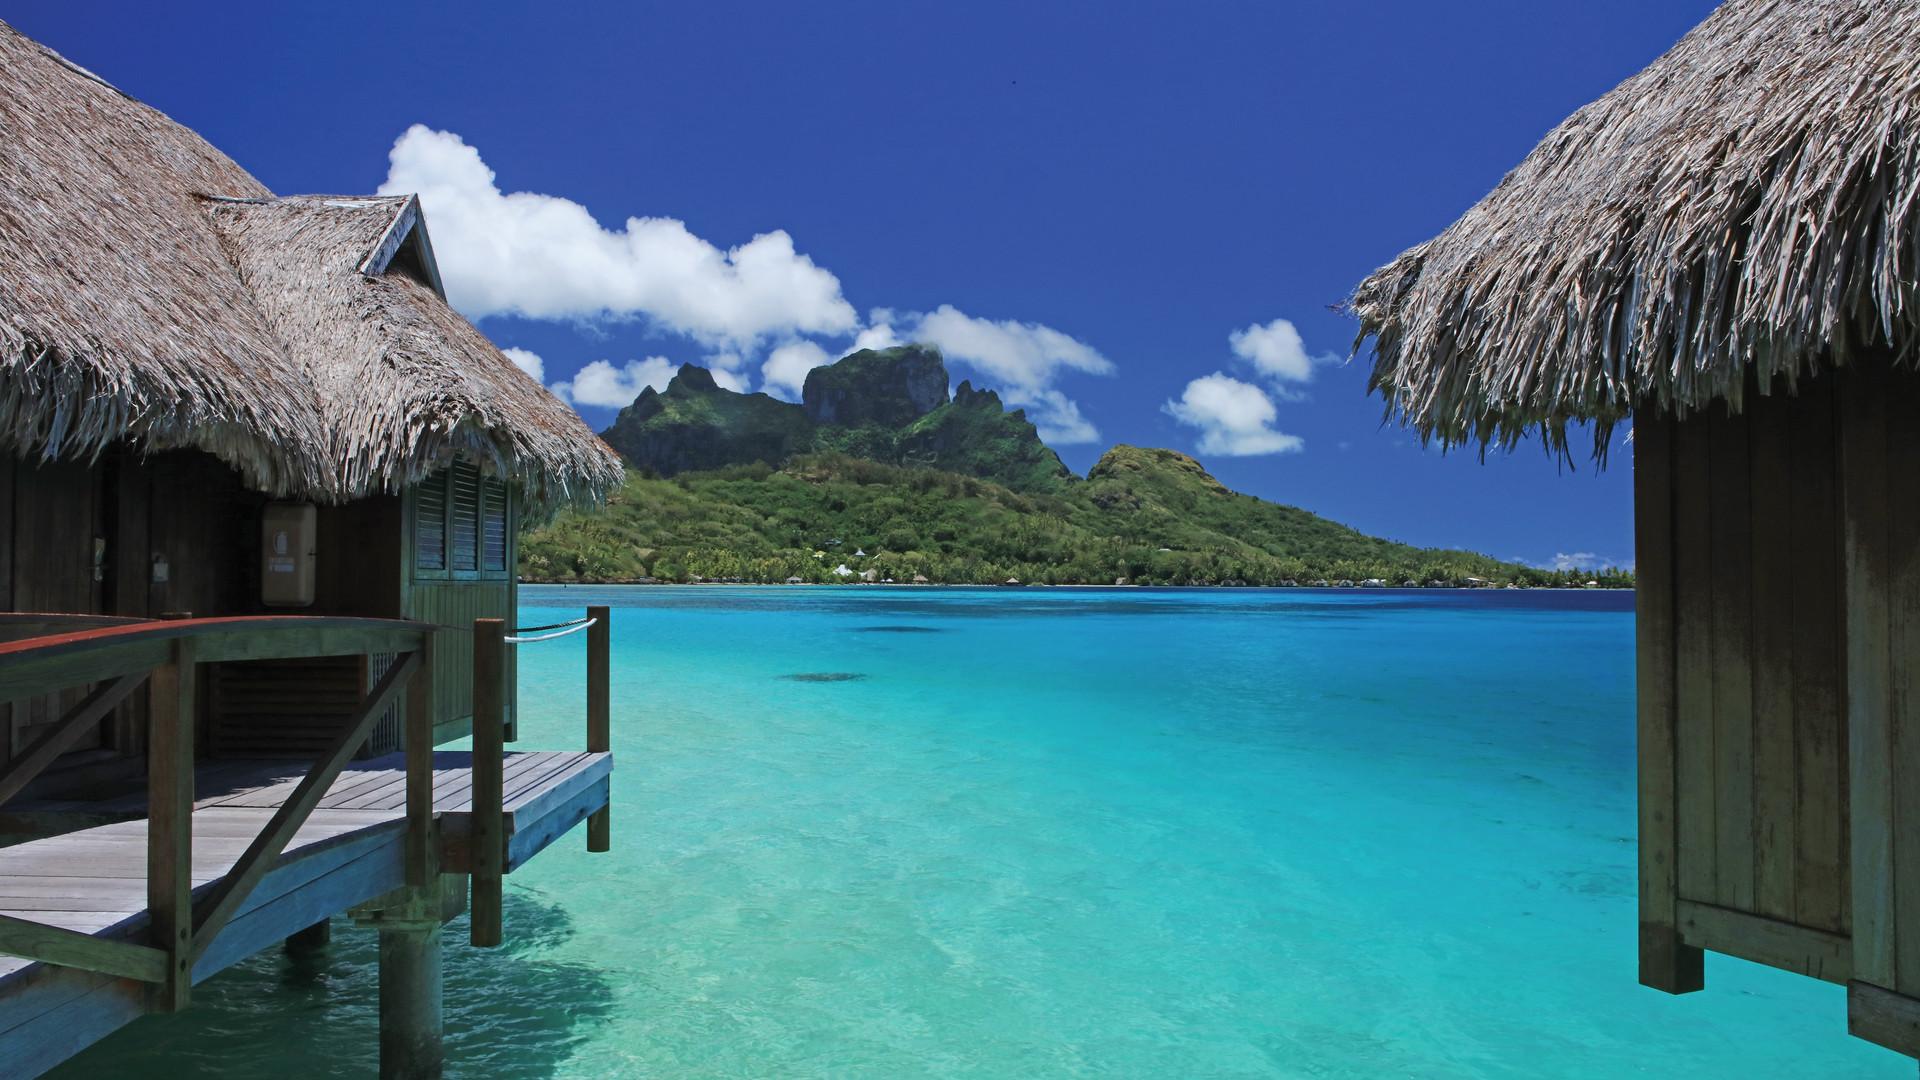 Sofitel_Bora_Bora_Private_Island-Blick_auf_Bora_Bora_Hauptinsel